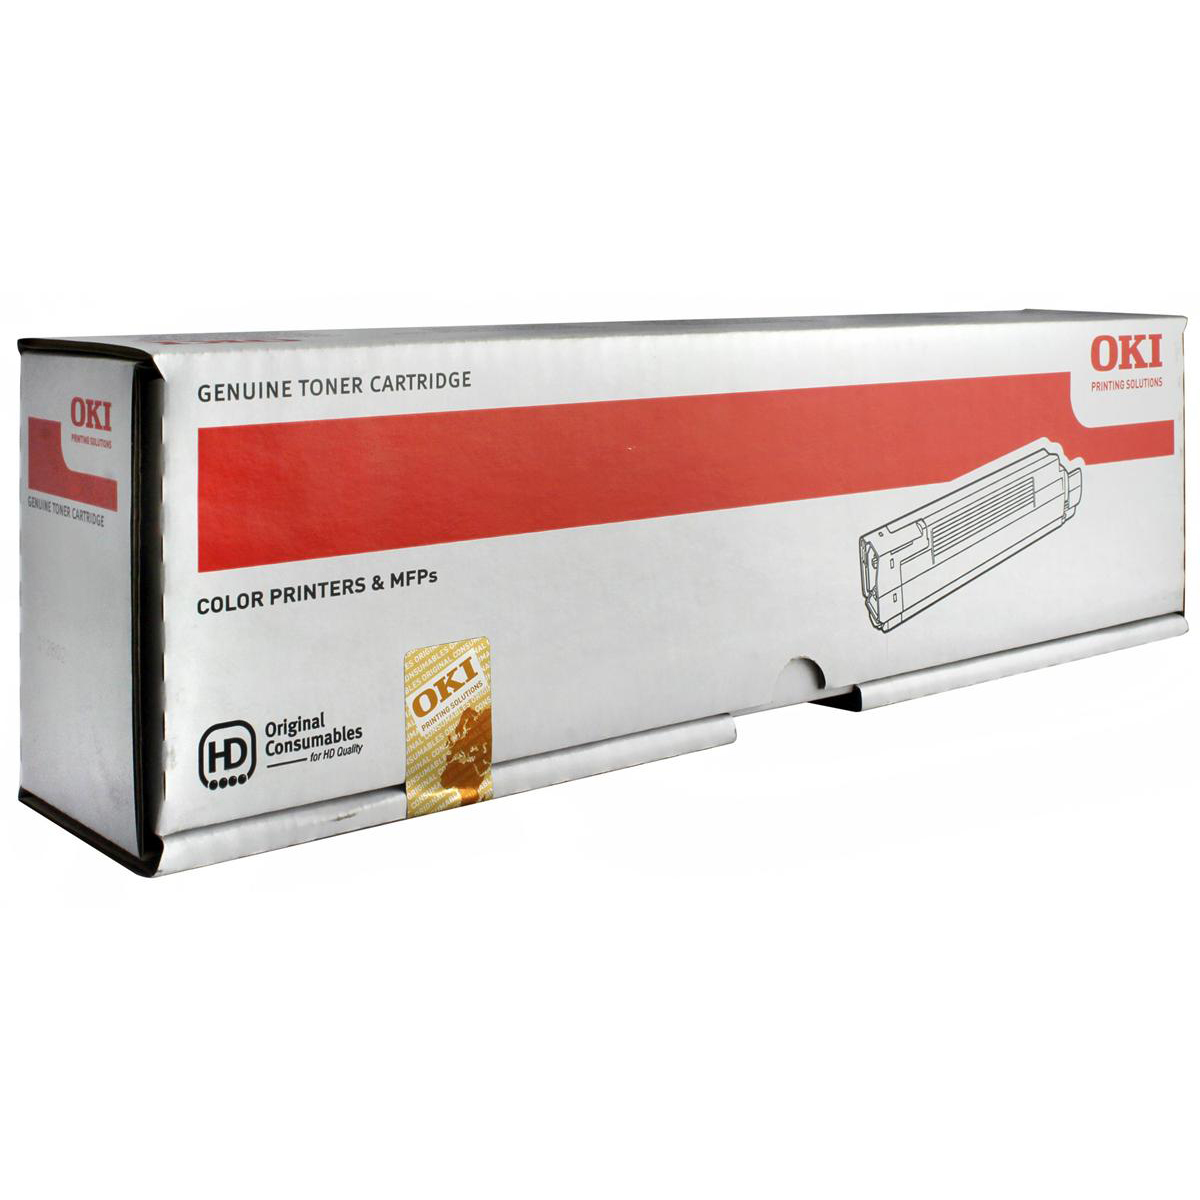 OKI Laser Toner Cartridge Page Life 7300pp Black Ref 44643004